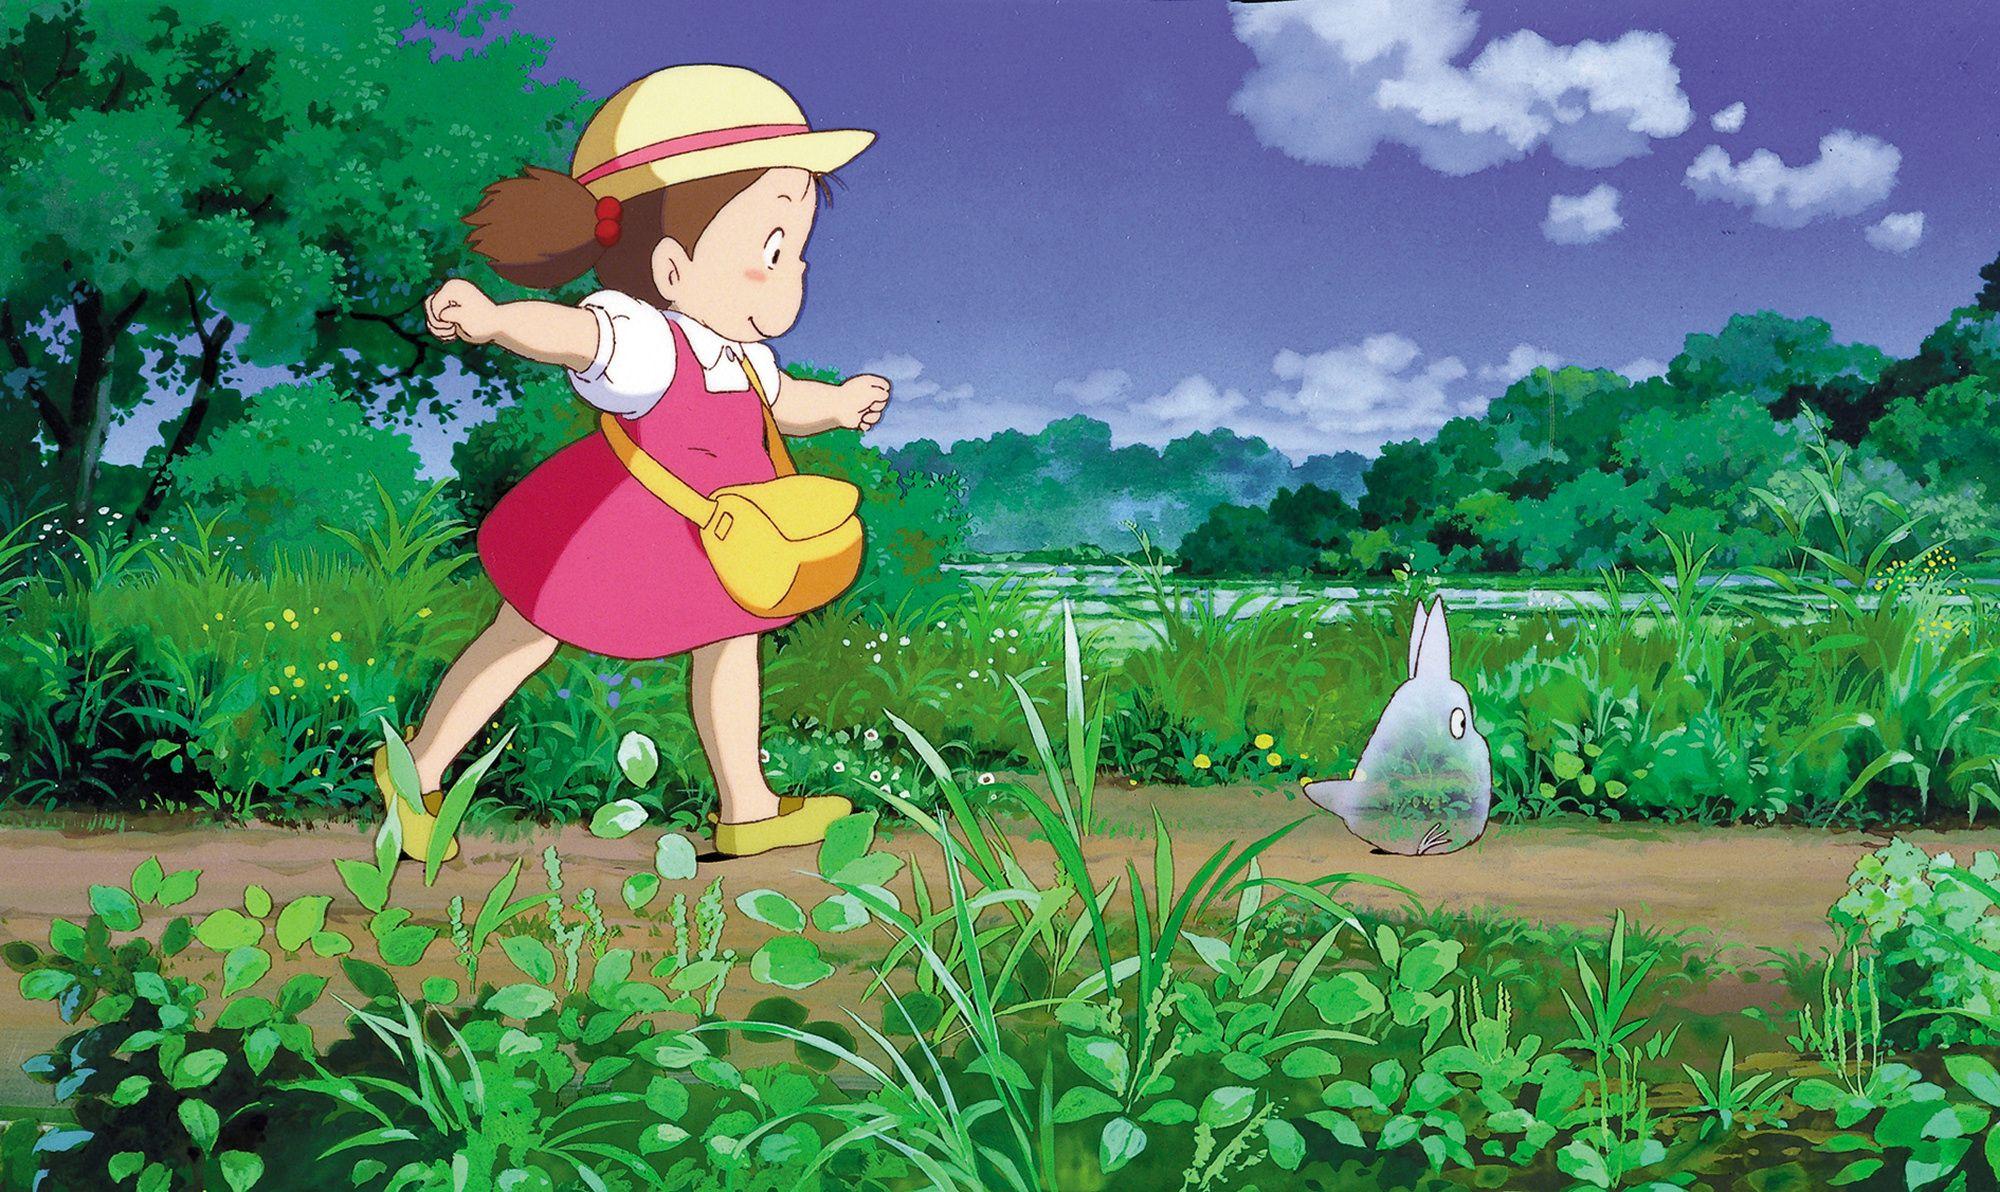 Tonari No Totoro Studio Ghibli Characters Studio Ghibli Totoro